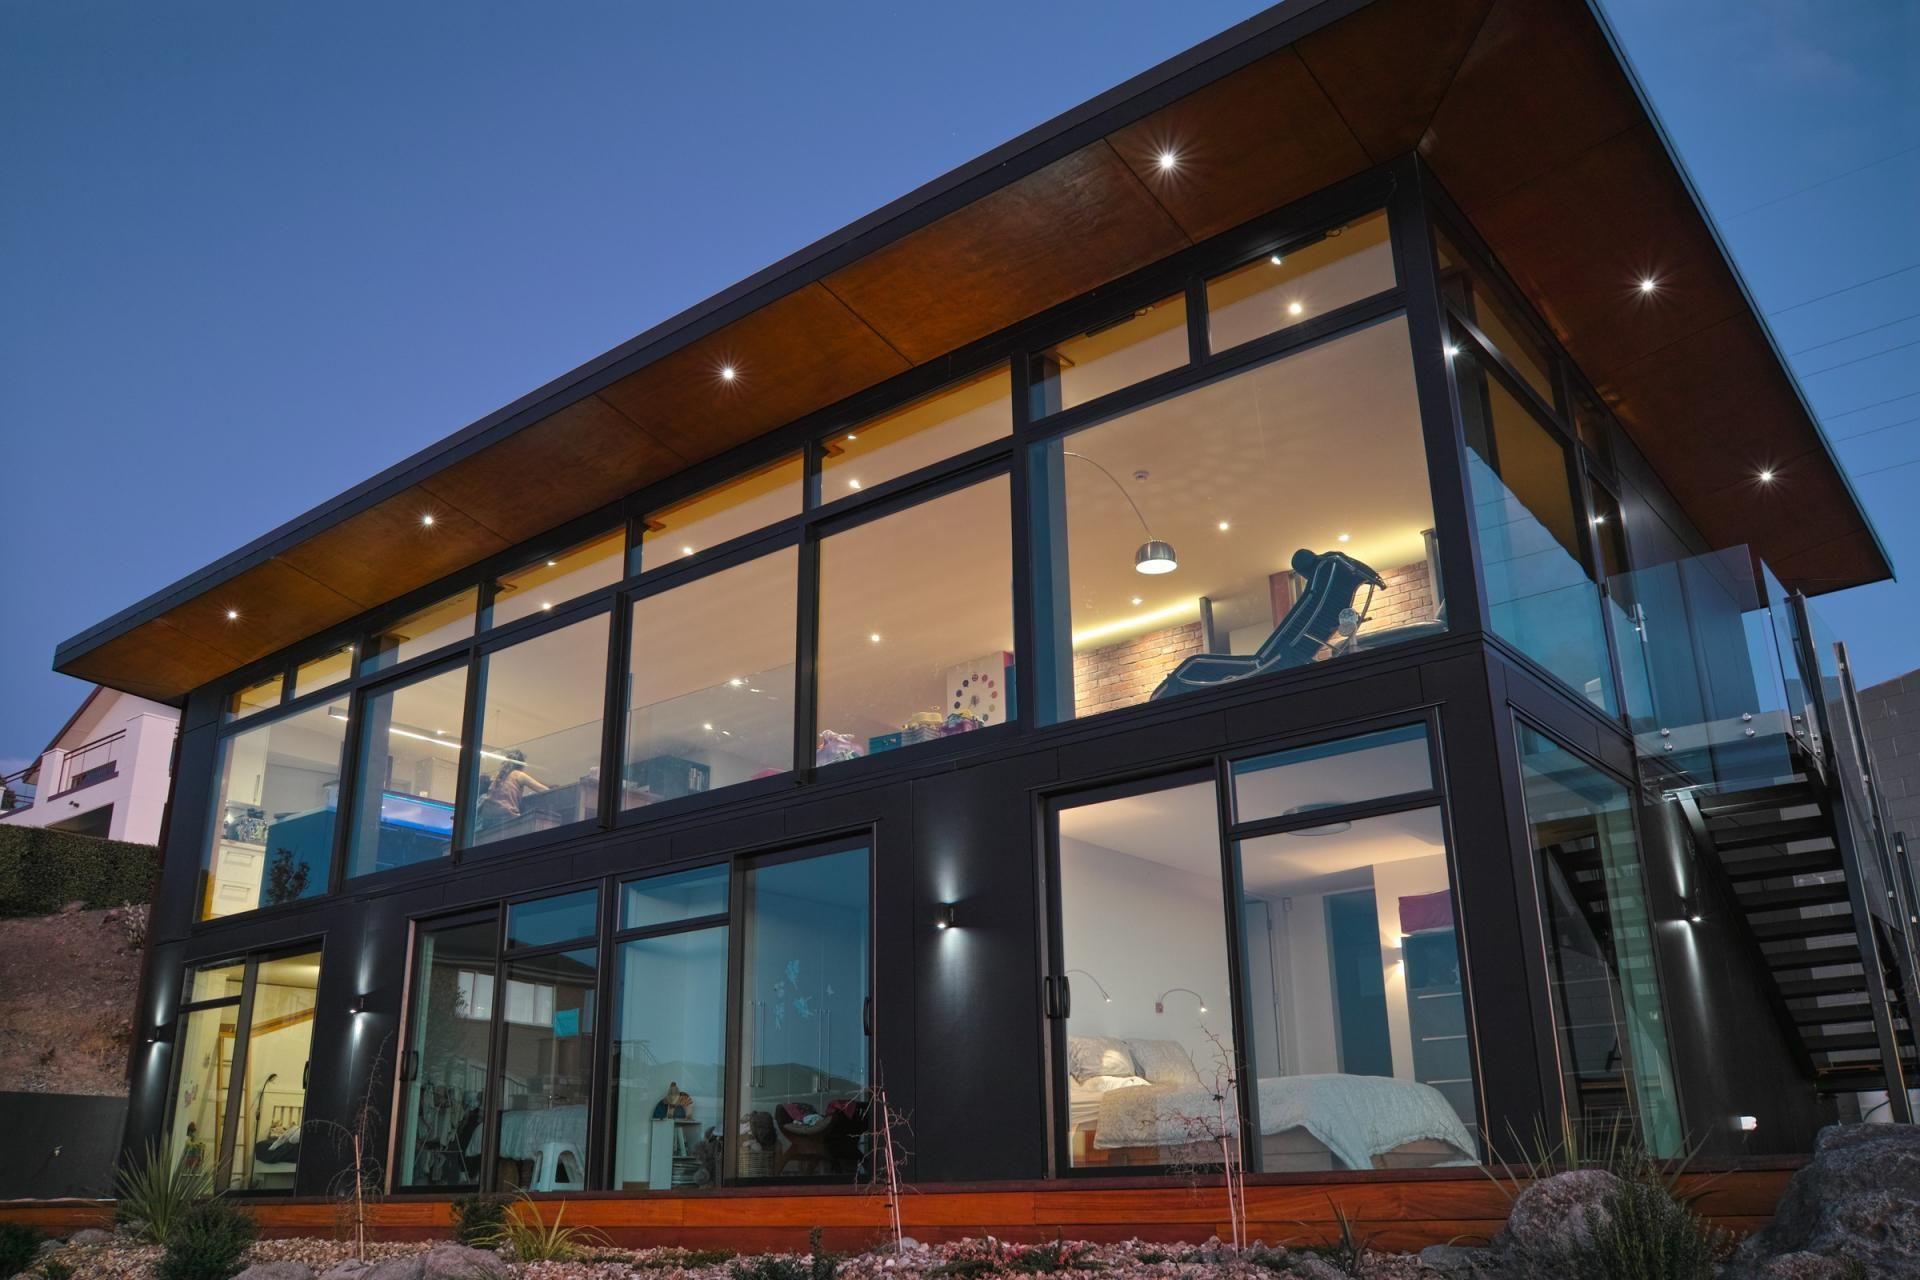 Black House by mc architecture studio ltd - New Zealand